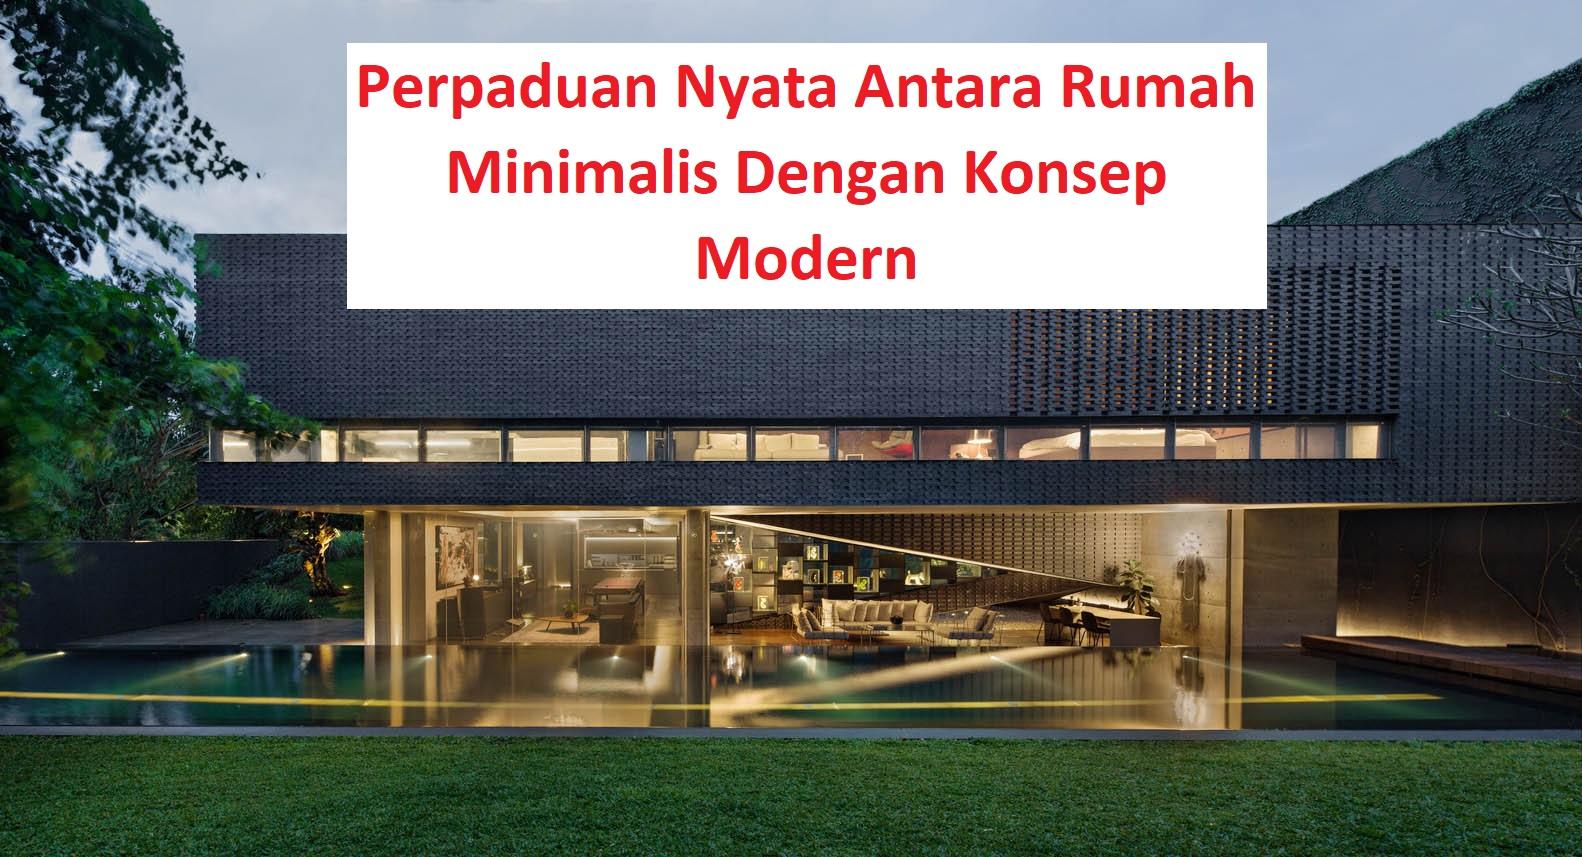 Perpaduan Nyata Antara Rumah Minimalis Dengan Konsep Modern